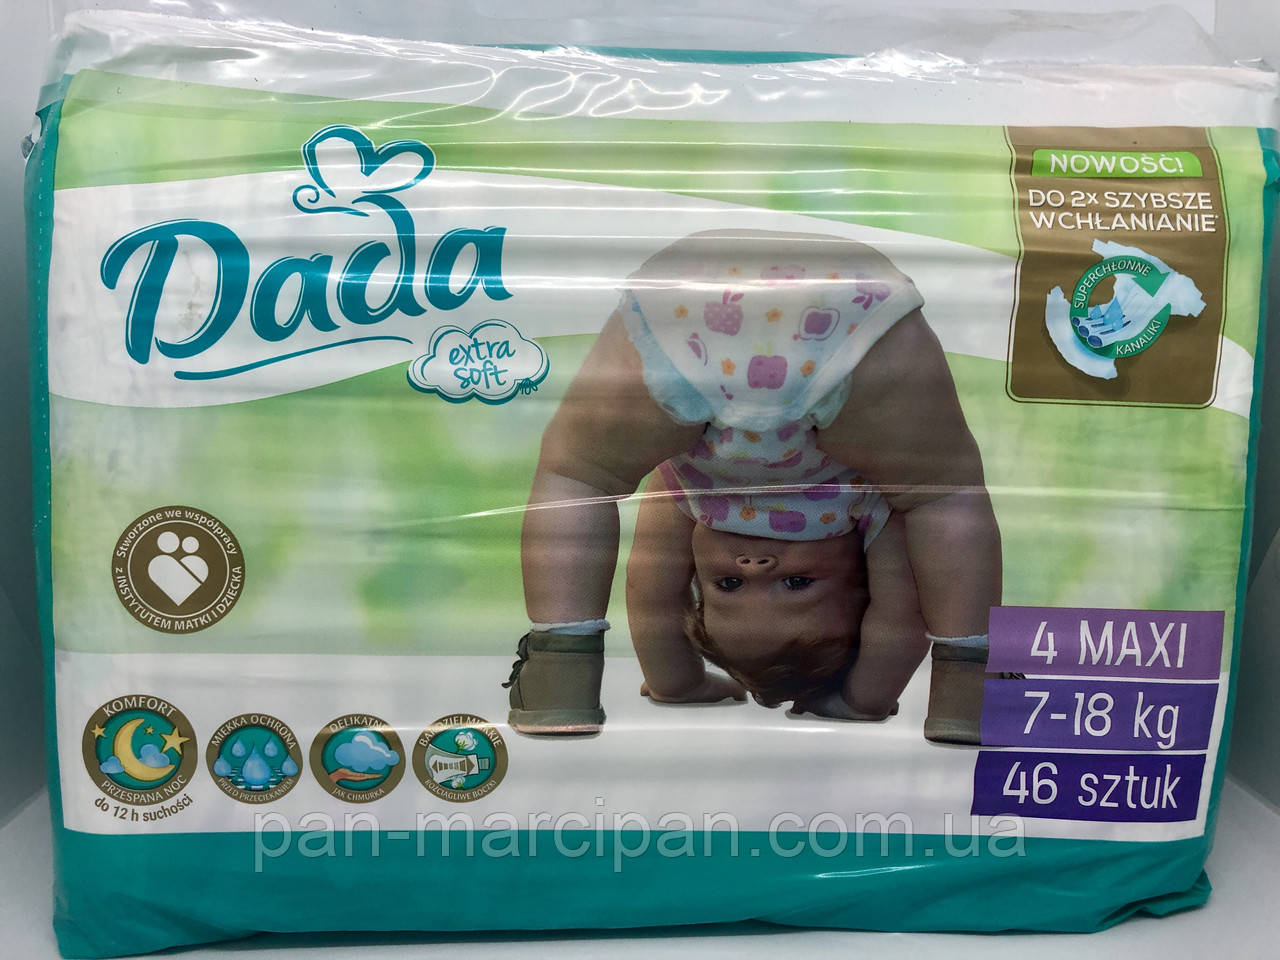 Підгузники Dada extra soft 4 (7-18кг) 46шт